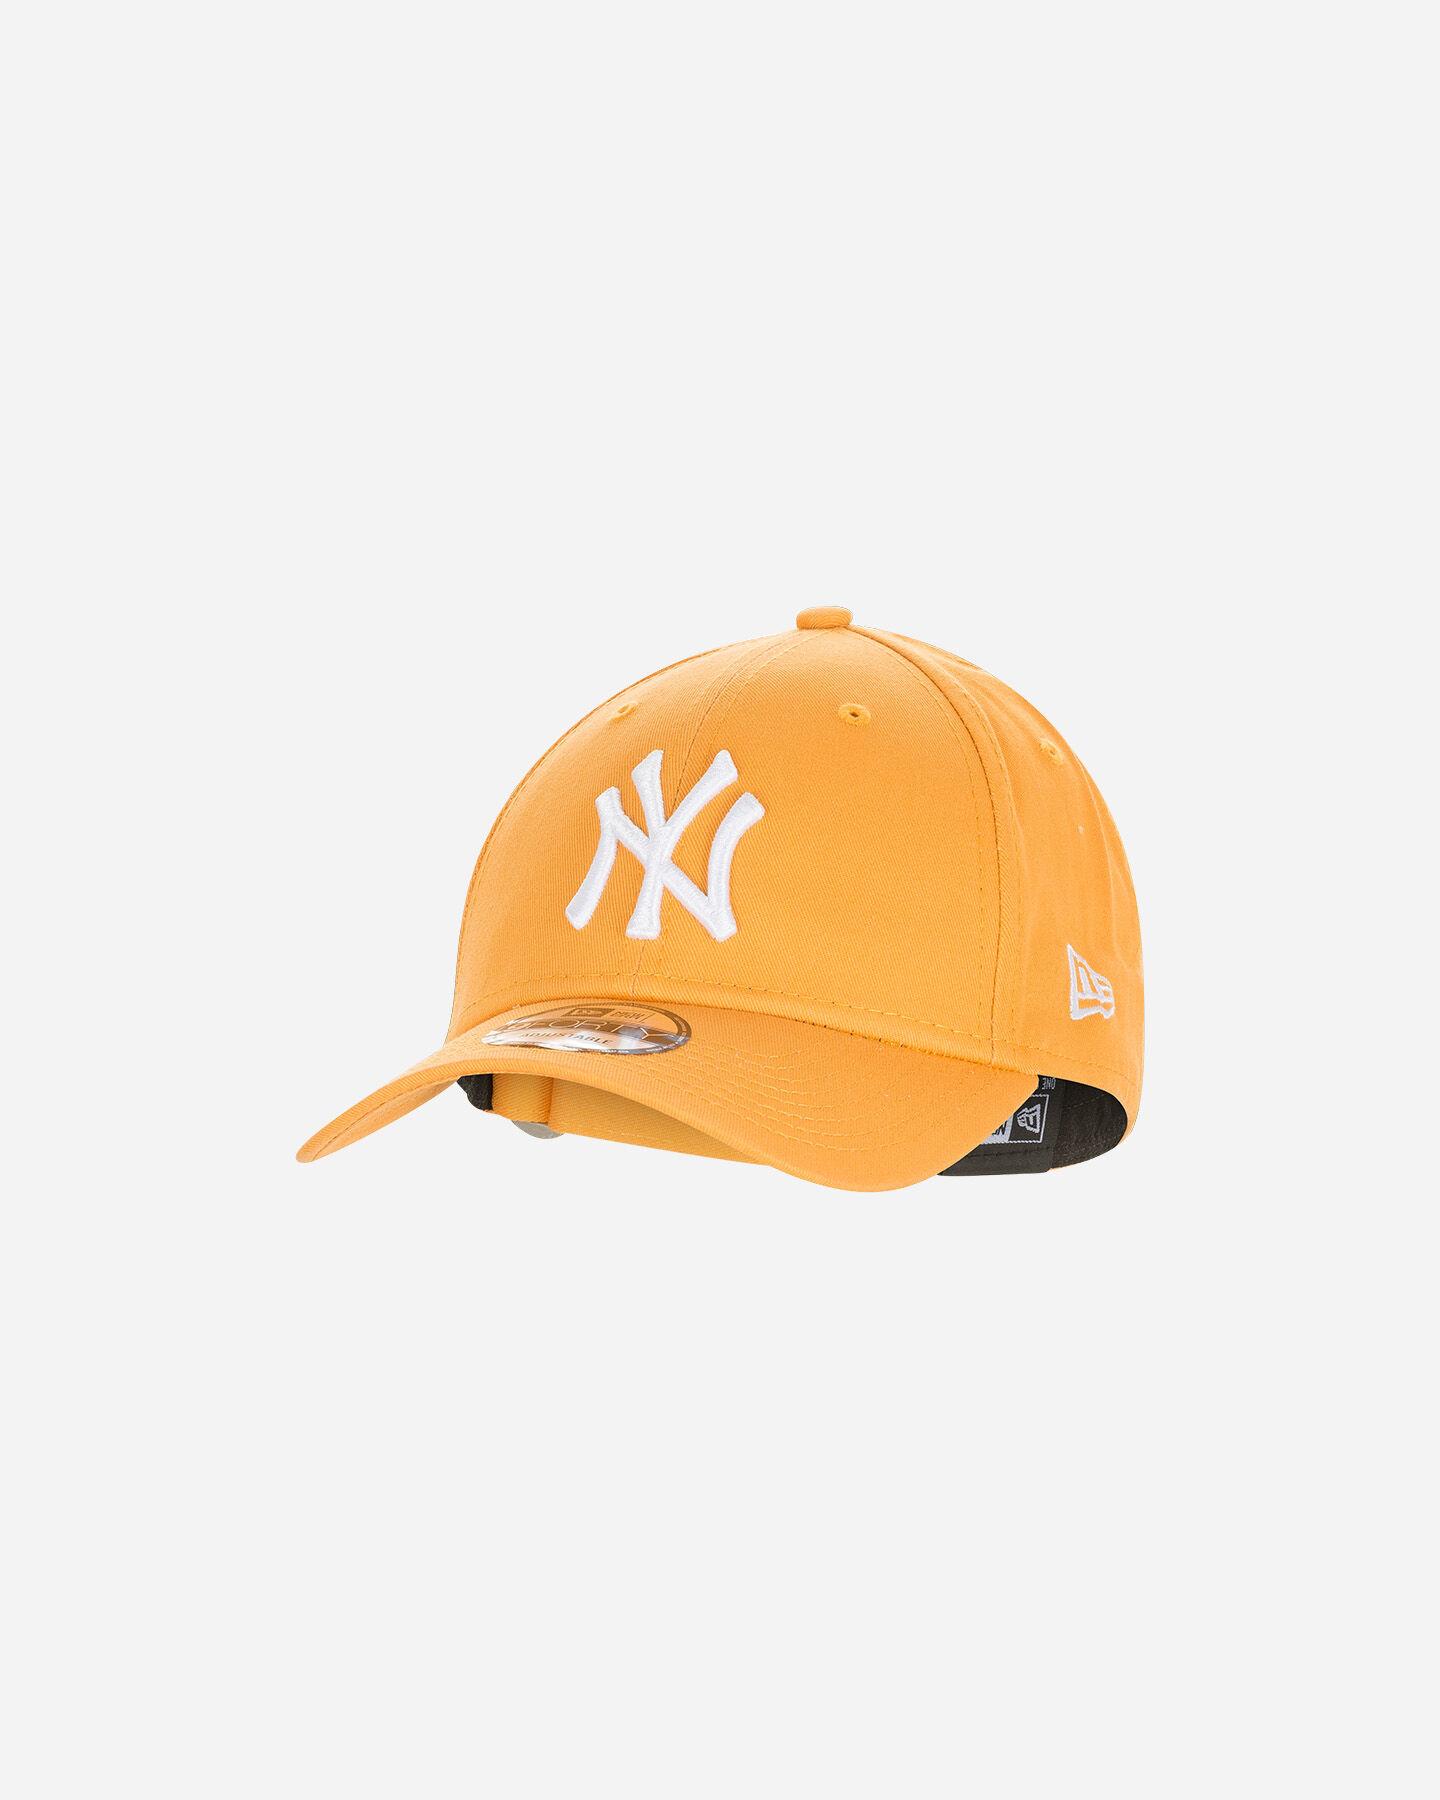 Cappellino NEW ERA 9FORTY NEW YORK YANKEES S5238904 220 OSFM scatto 0